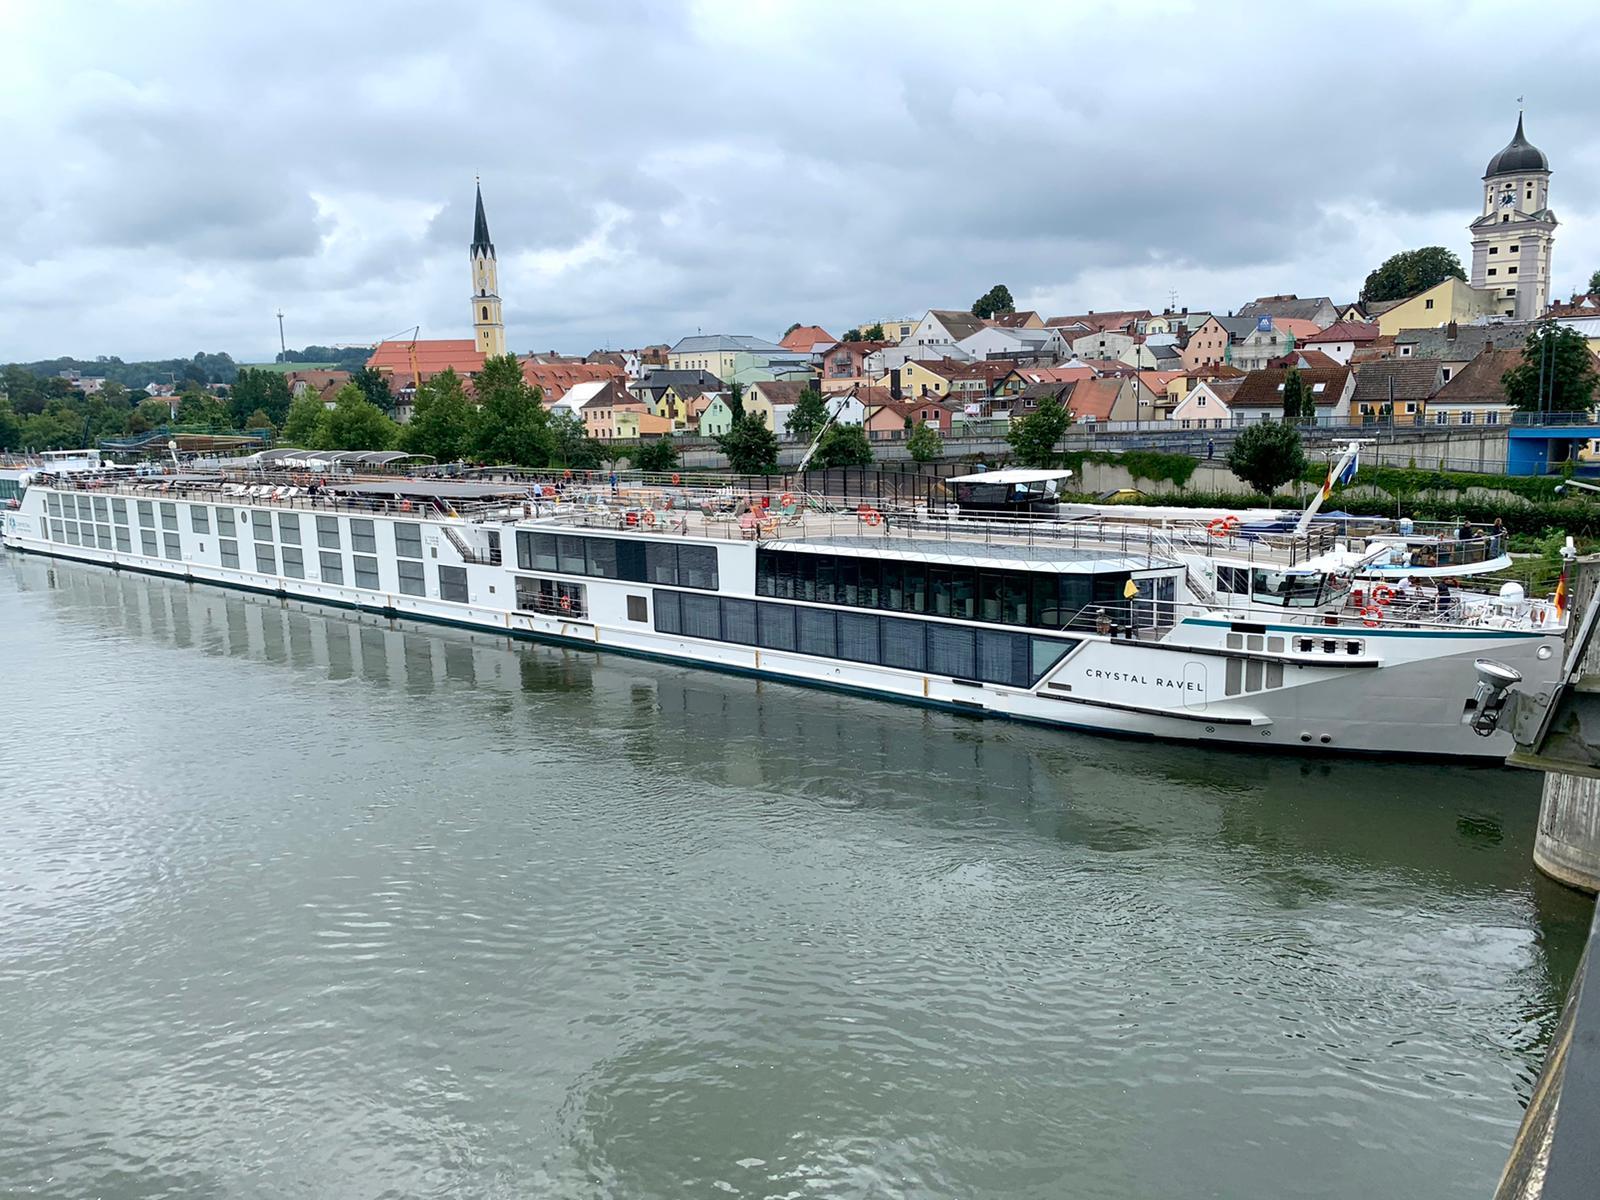 Crystal Ravel River Cruise